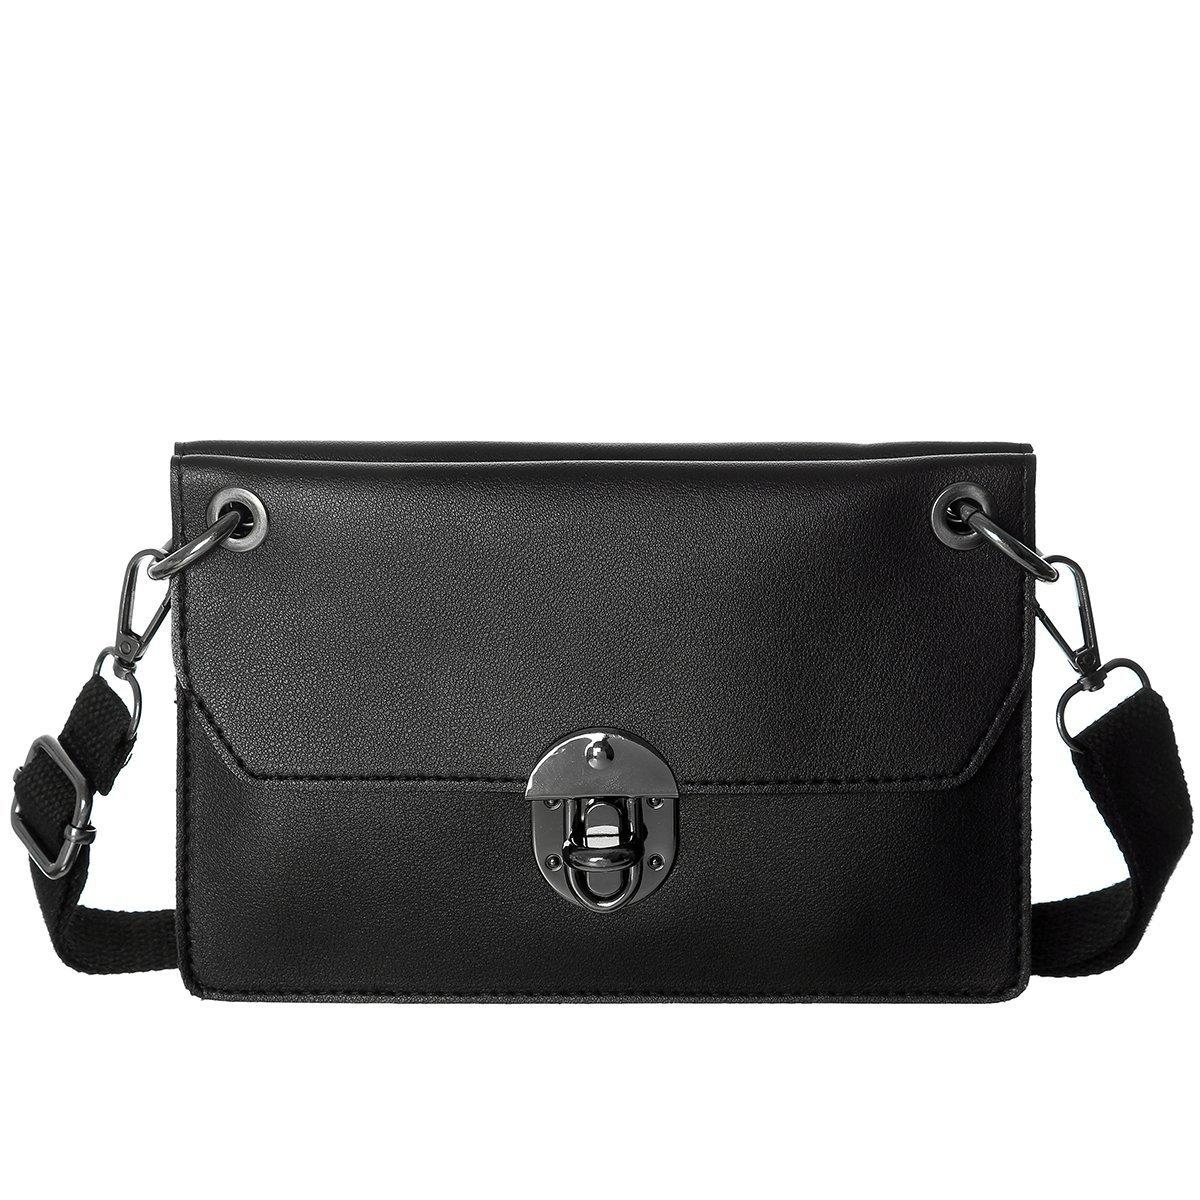 Small Crssobody Bag Double Separate Pockets Crossbody Shoulder Handbag Wallet For Women(Black2)